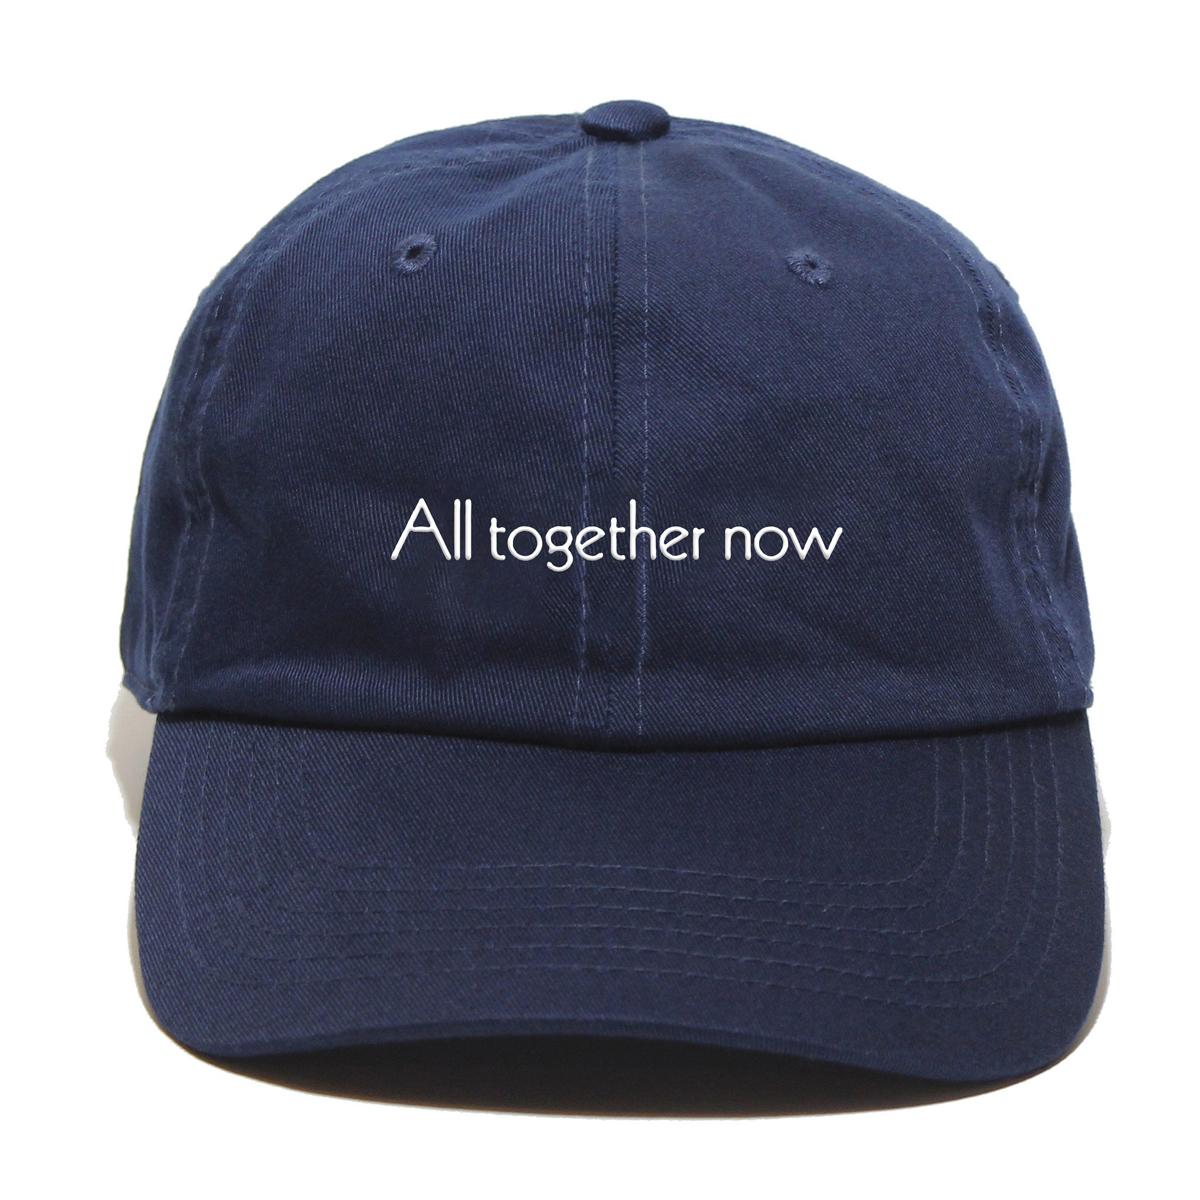 All Together Now Adjustable Hat